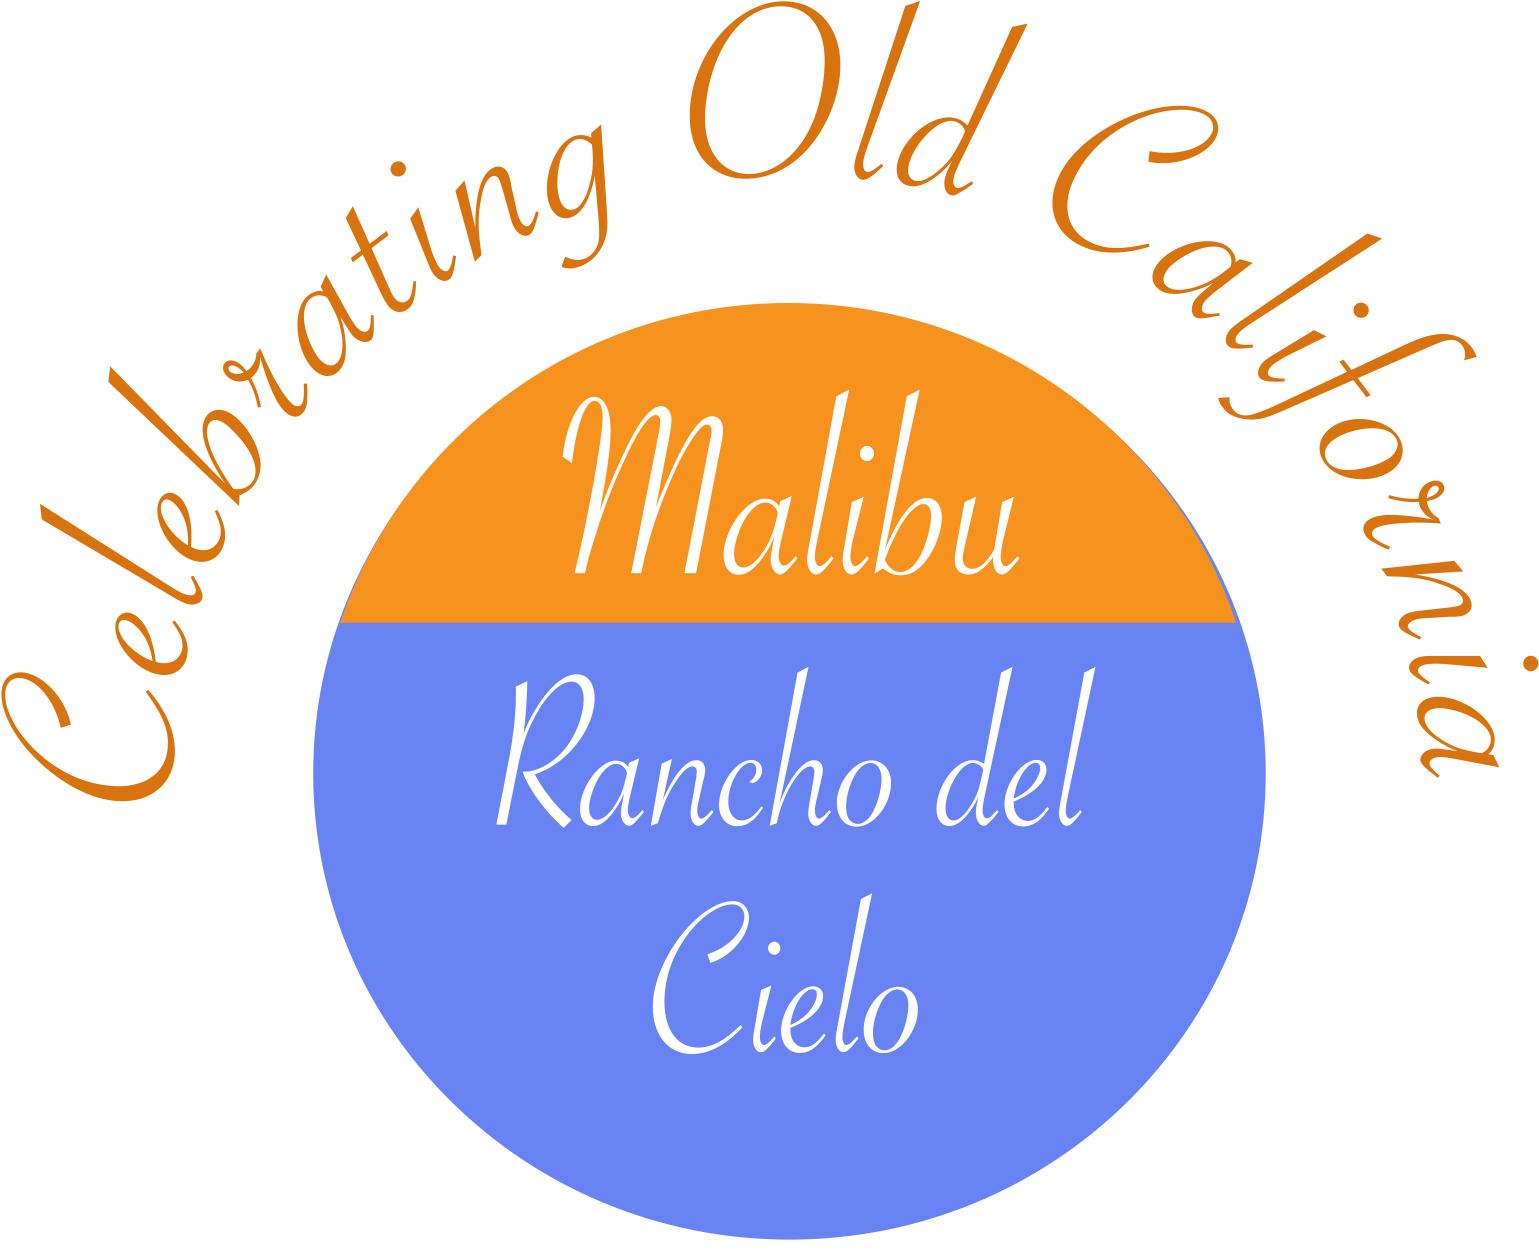 logo_ranchoCielo_2018.jpg